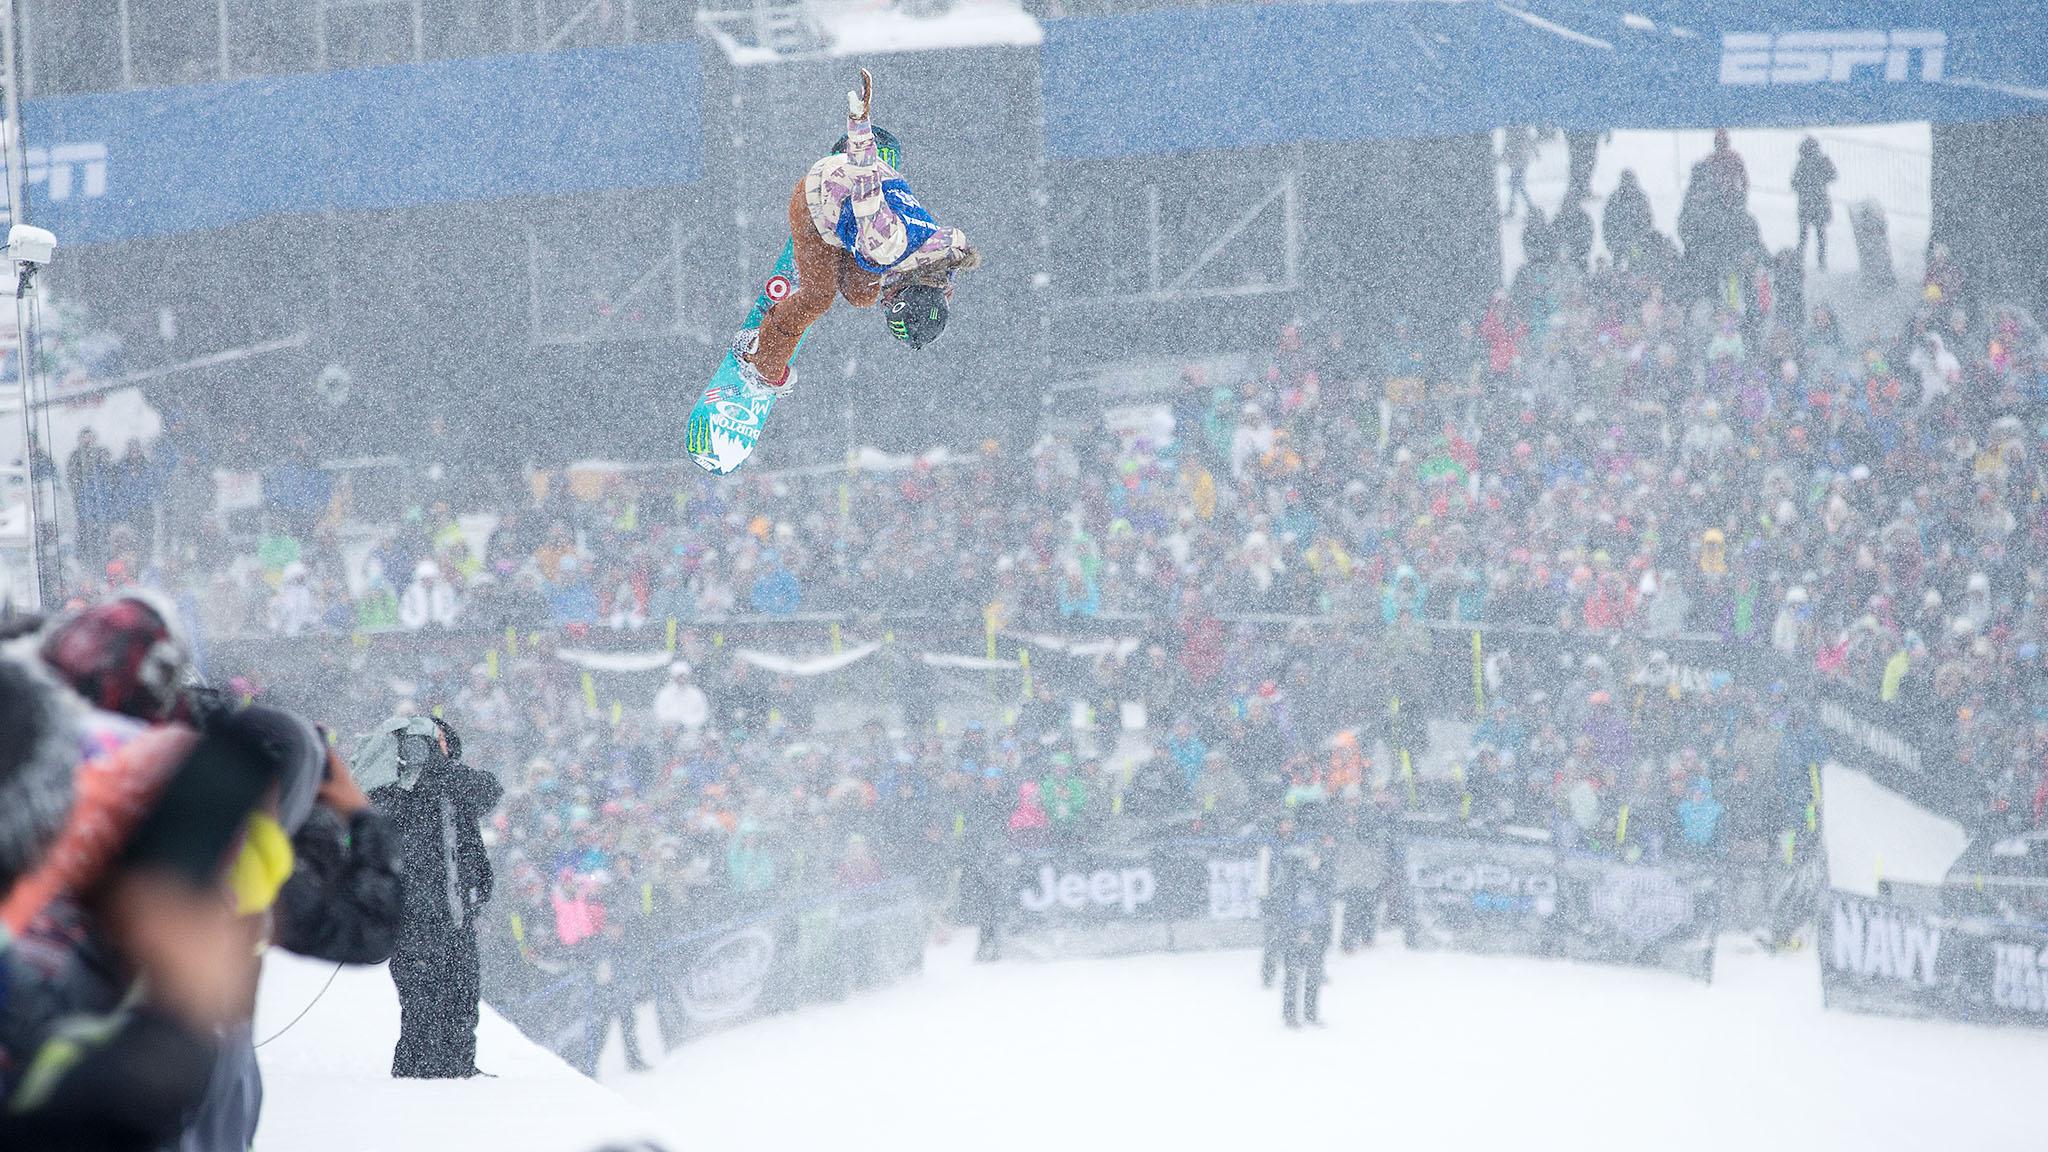 Women's Snowboard SuperPipe: Chloe Kim